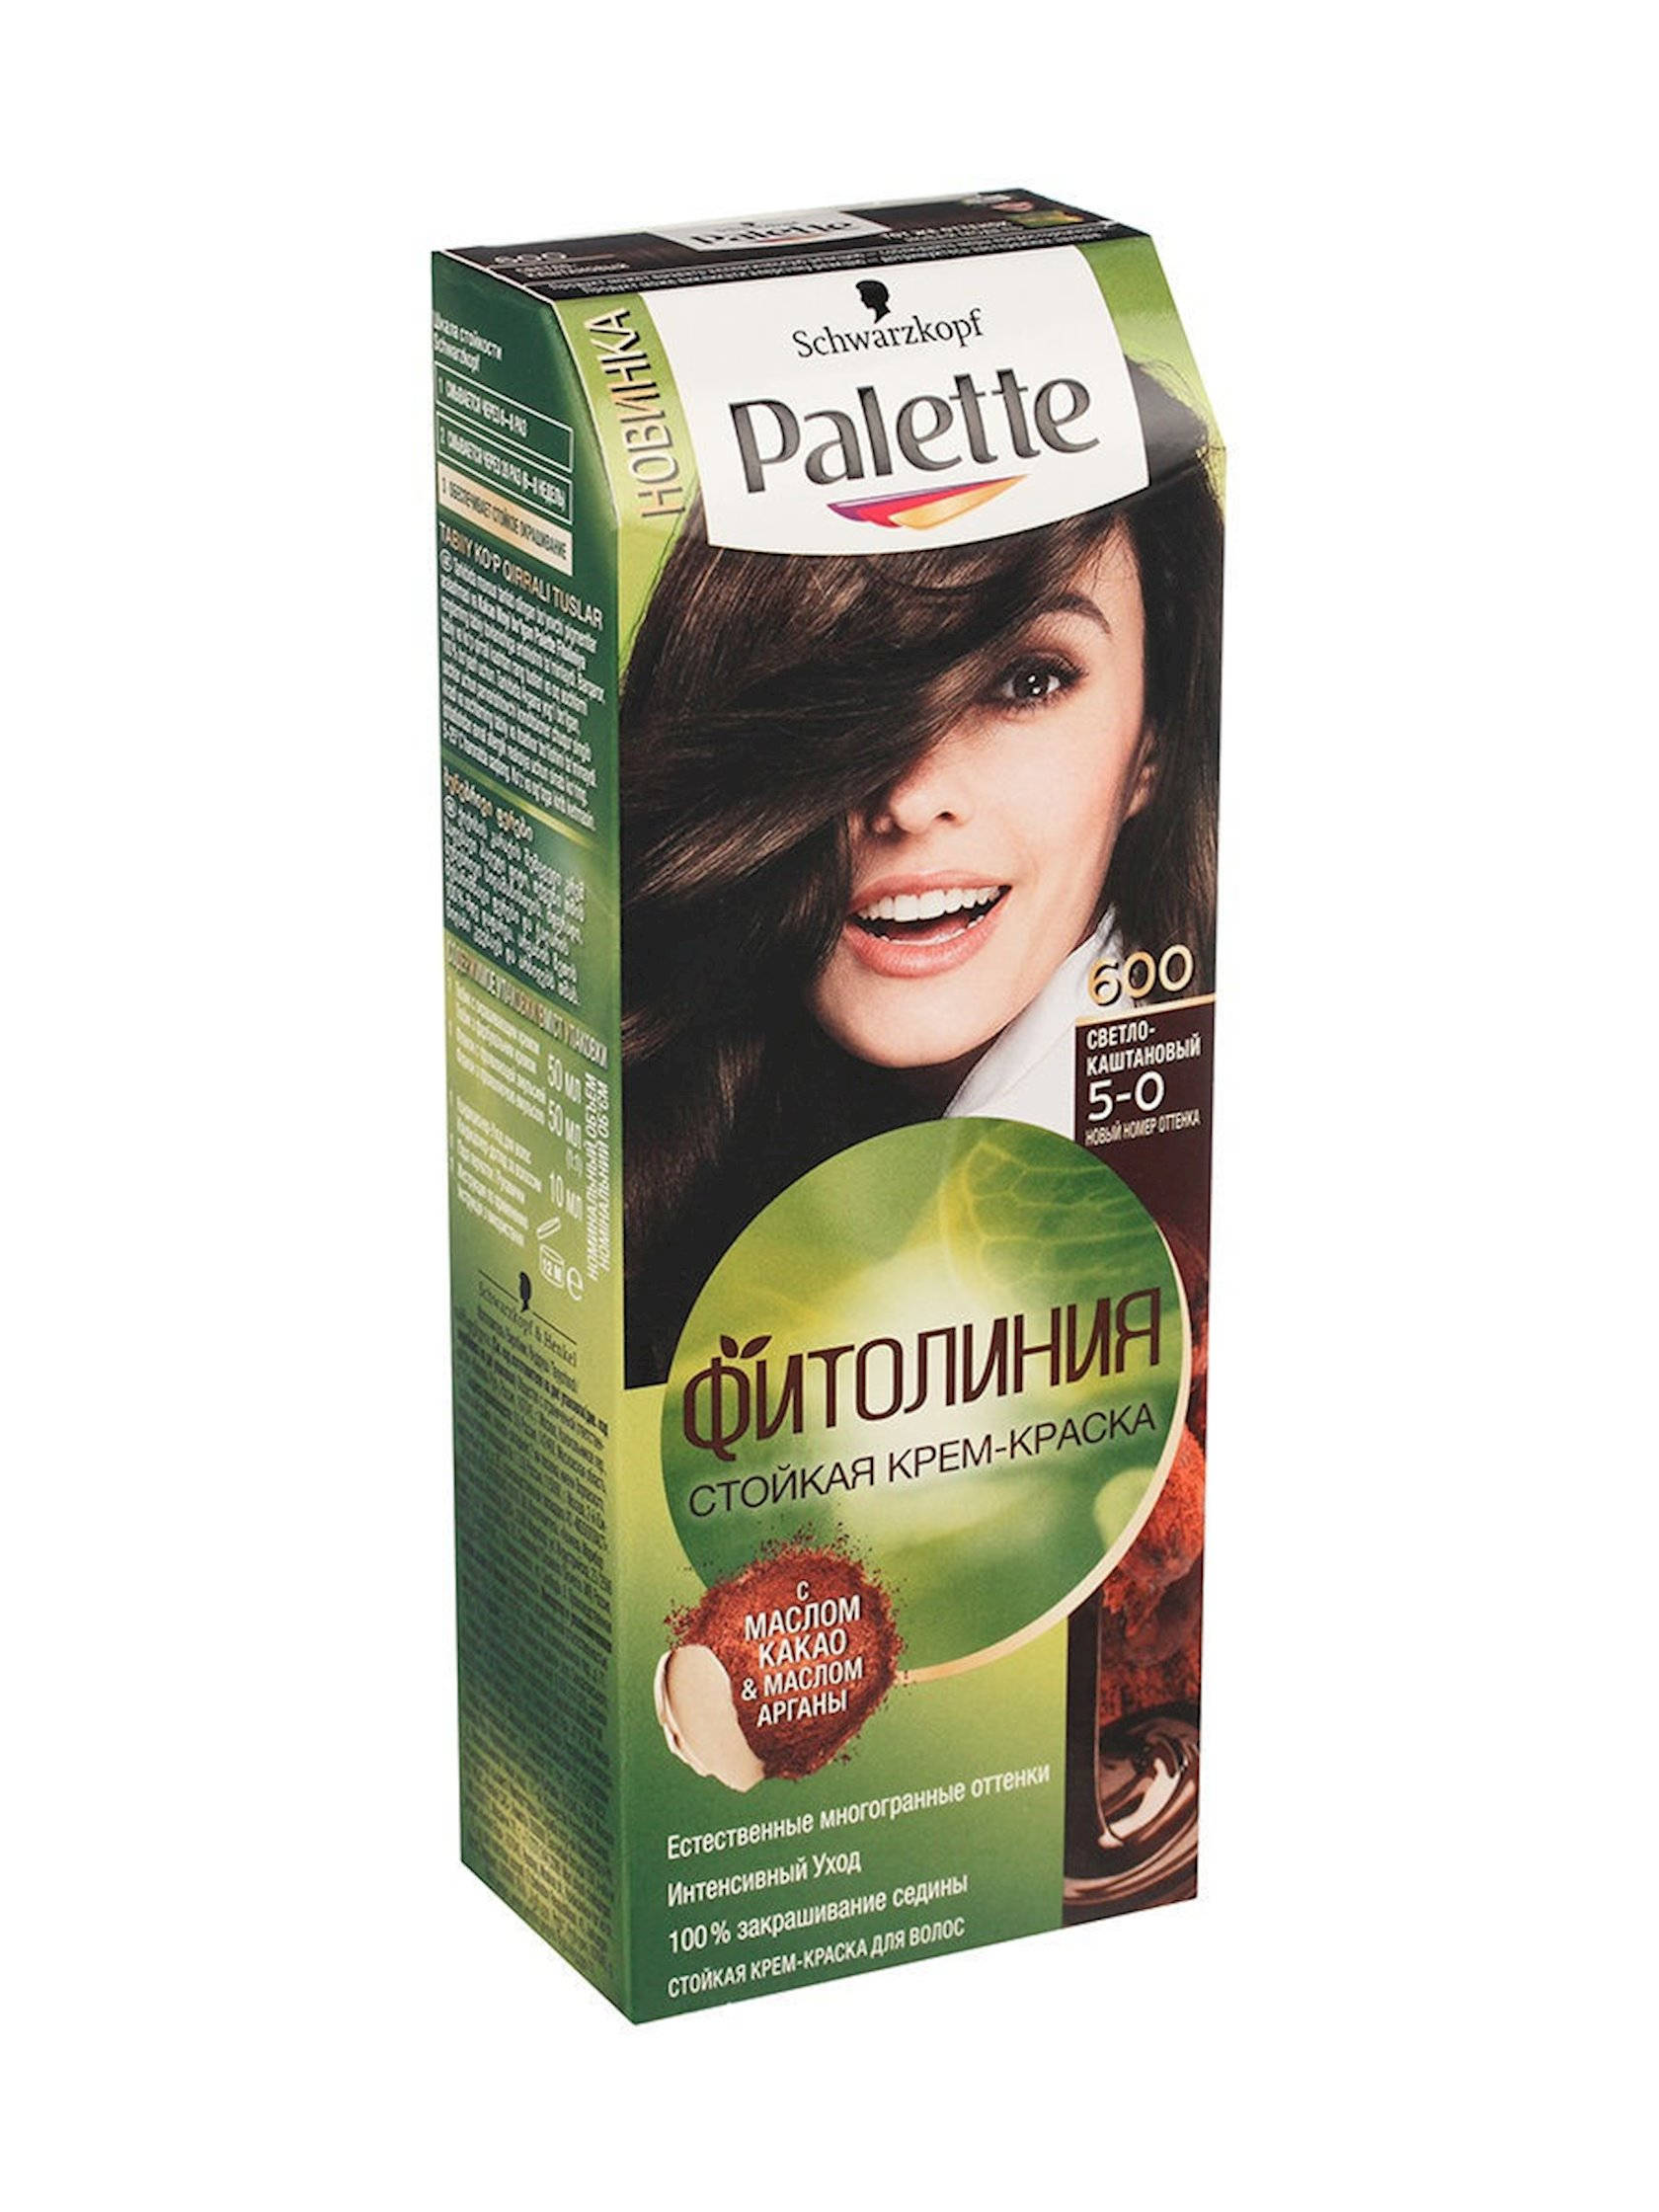 Saç boyası Palette Fitoliniya 600 5-0 Açıq şabalıdı